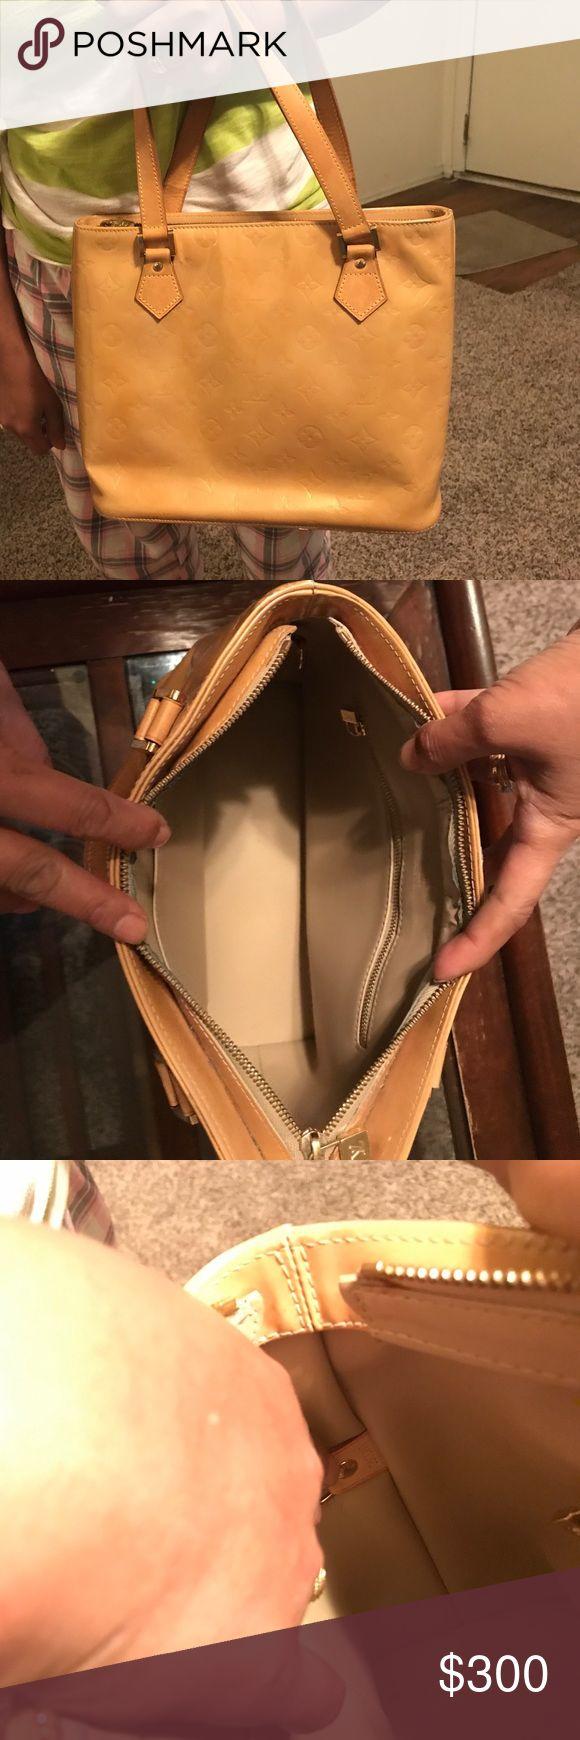 Louis Vouitton hand bag tan to cream louis vouitton handbag Louis Vuitton Bags Shoulder Bags